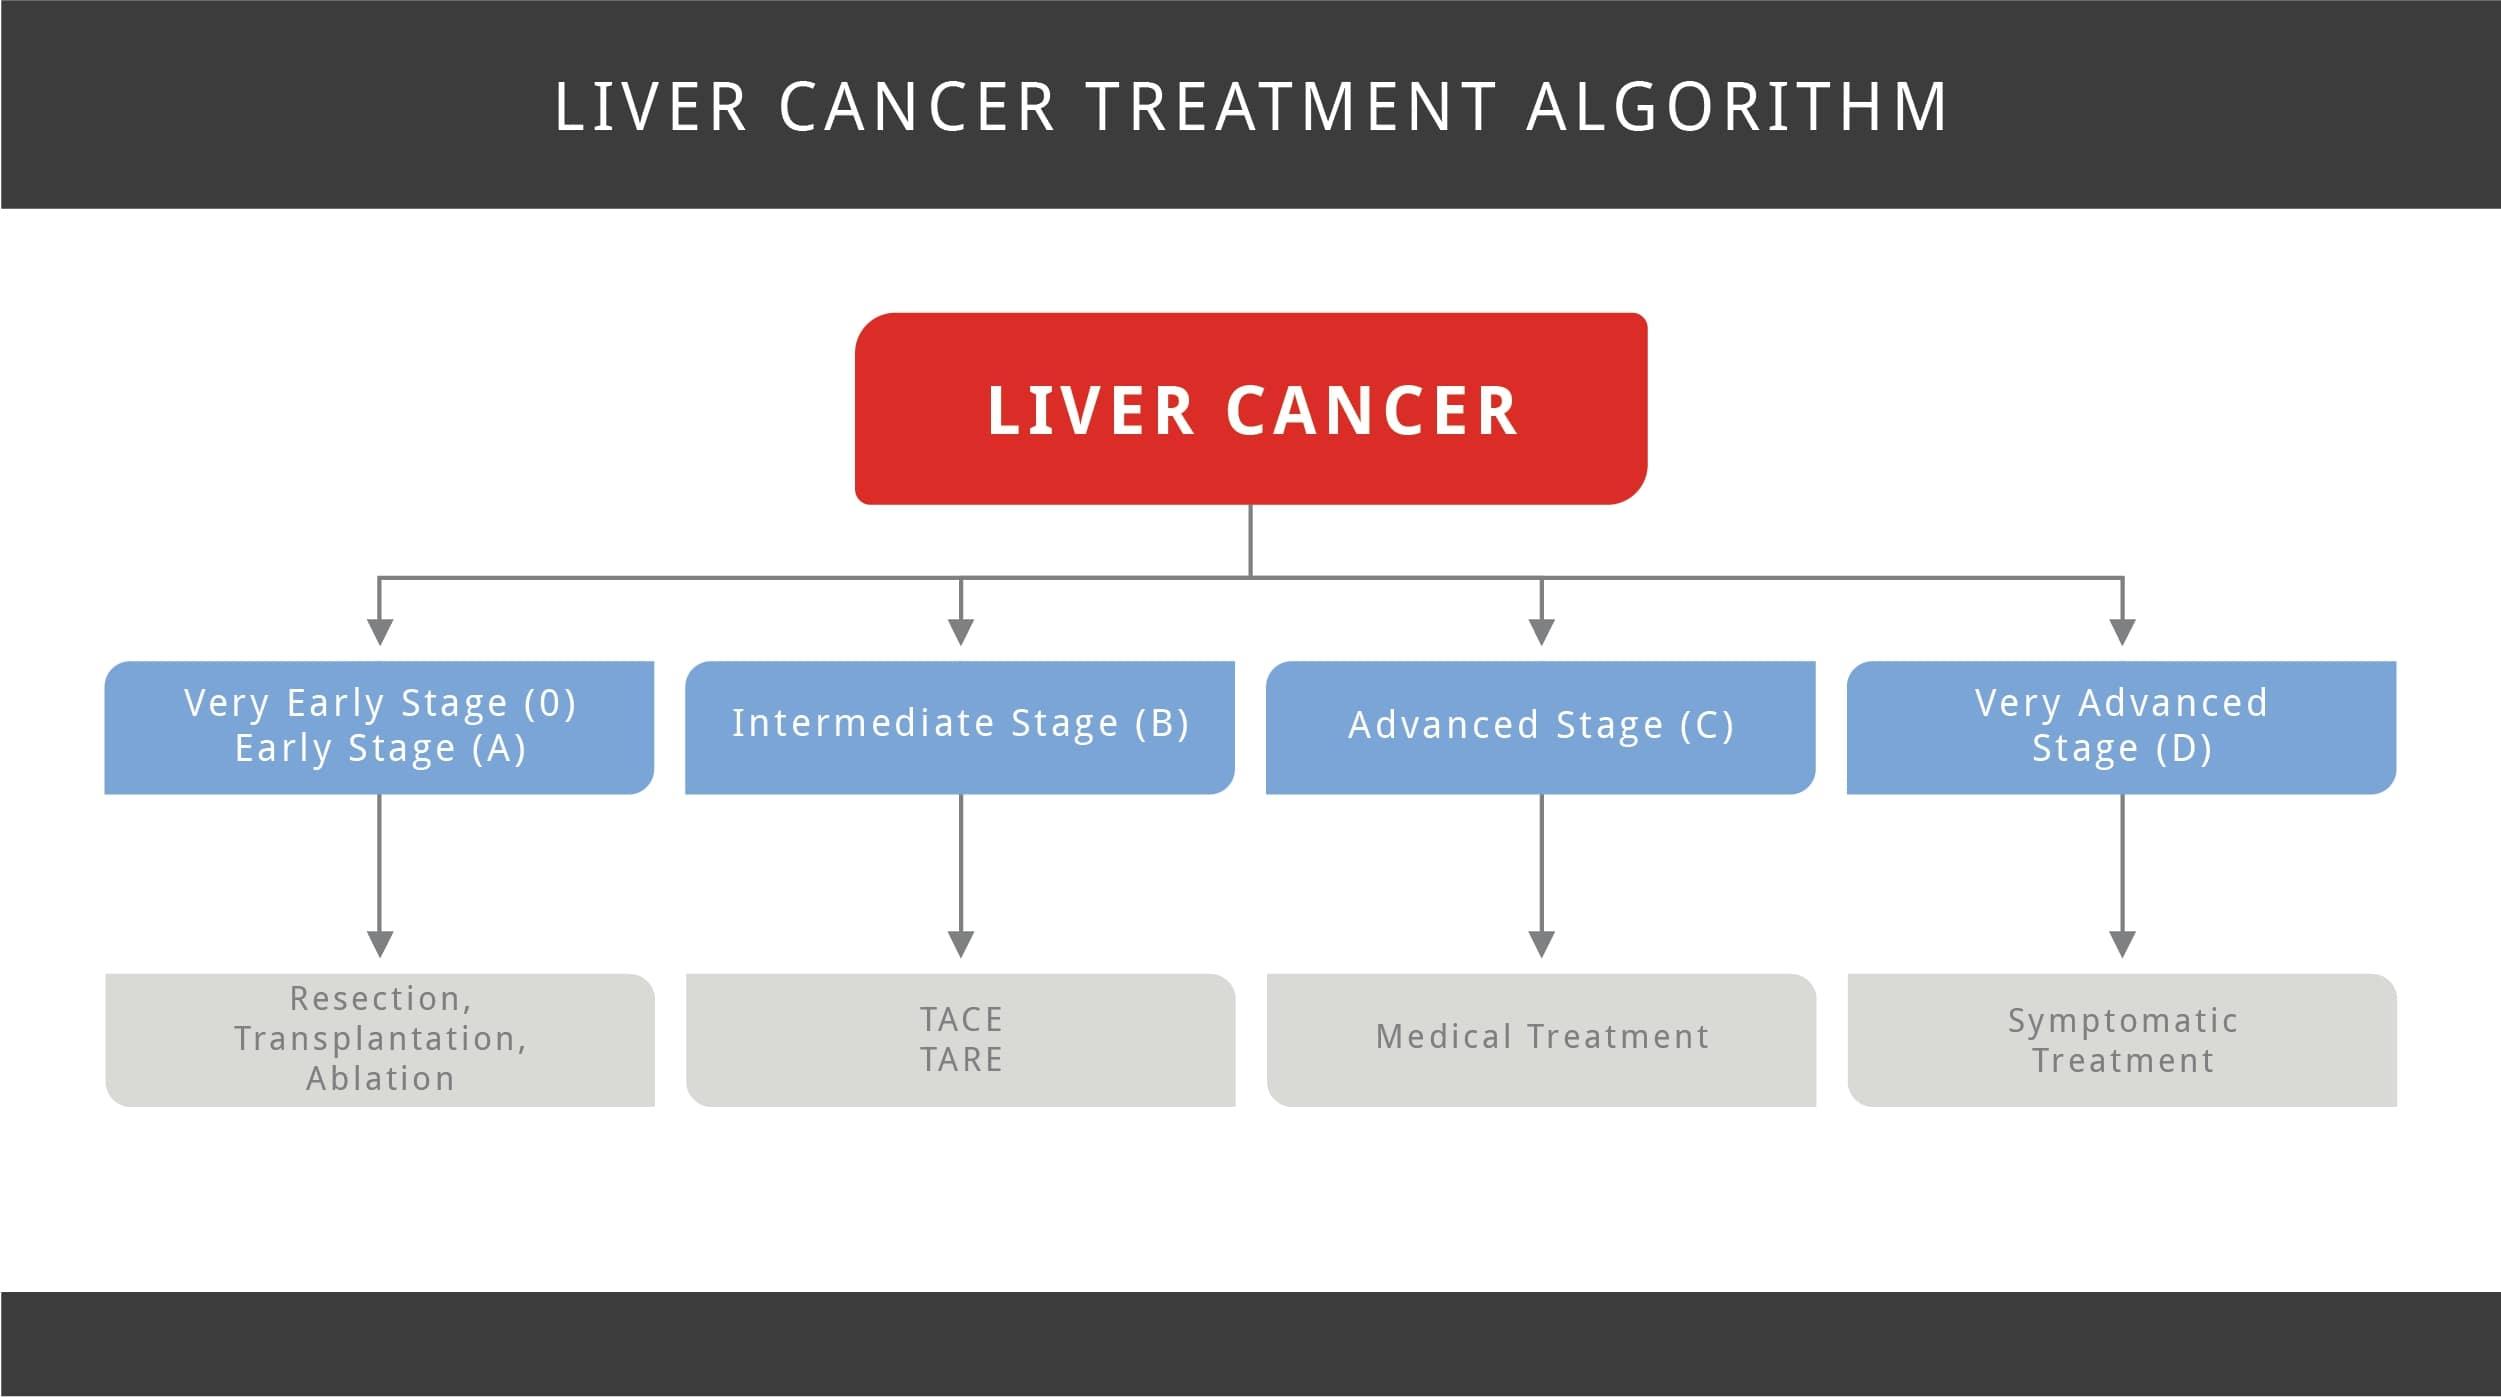 Liver Cancer Treatment Algorithm